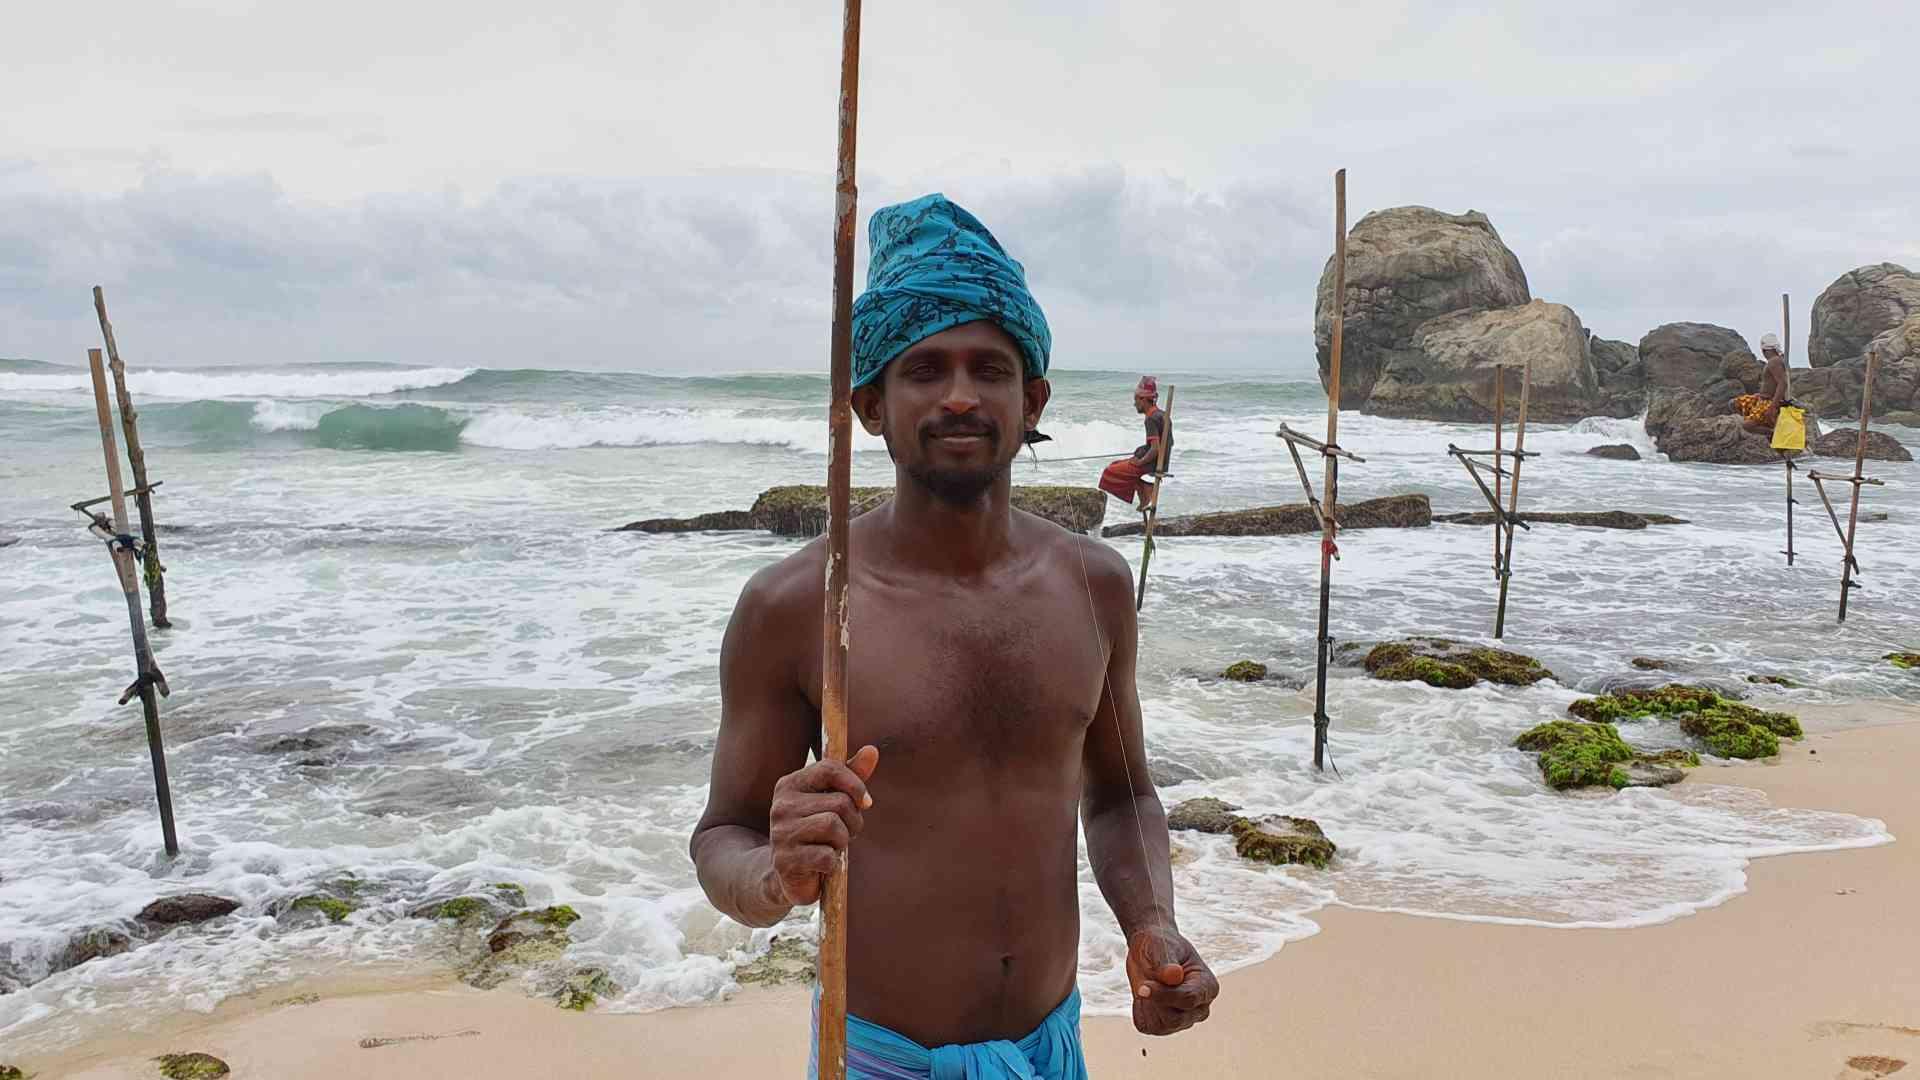 Stilt Fishermen, Weligama, Sri Lanka by Dennis Bunnik